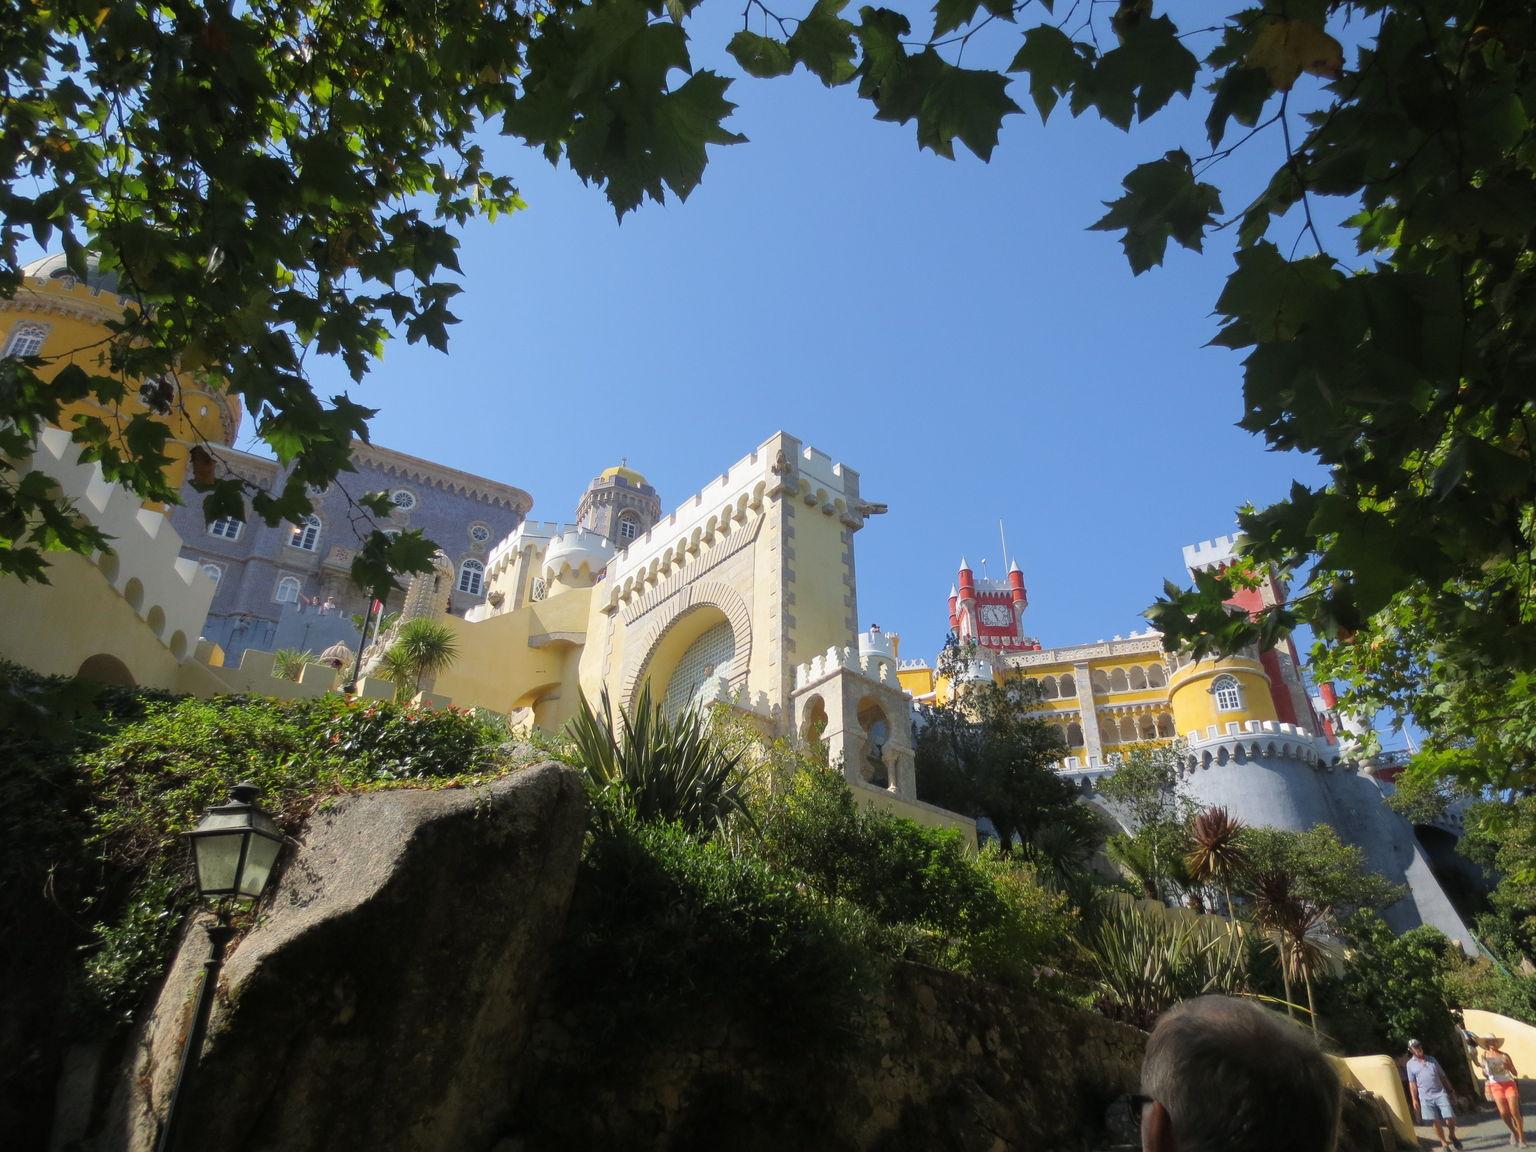 MÁS FOTOS, Tour de medio dia al Palacio da Pena, Sintra y Cascais desde Lisboa